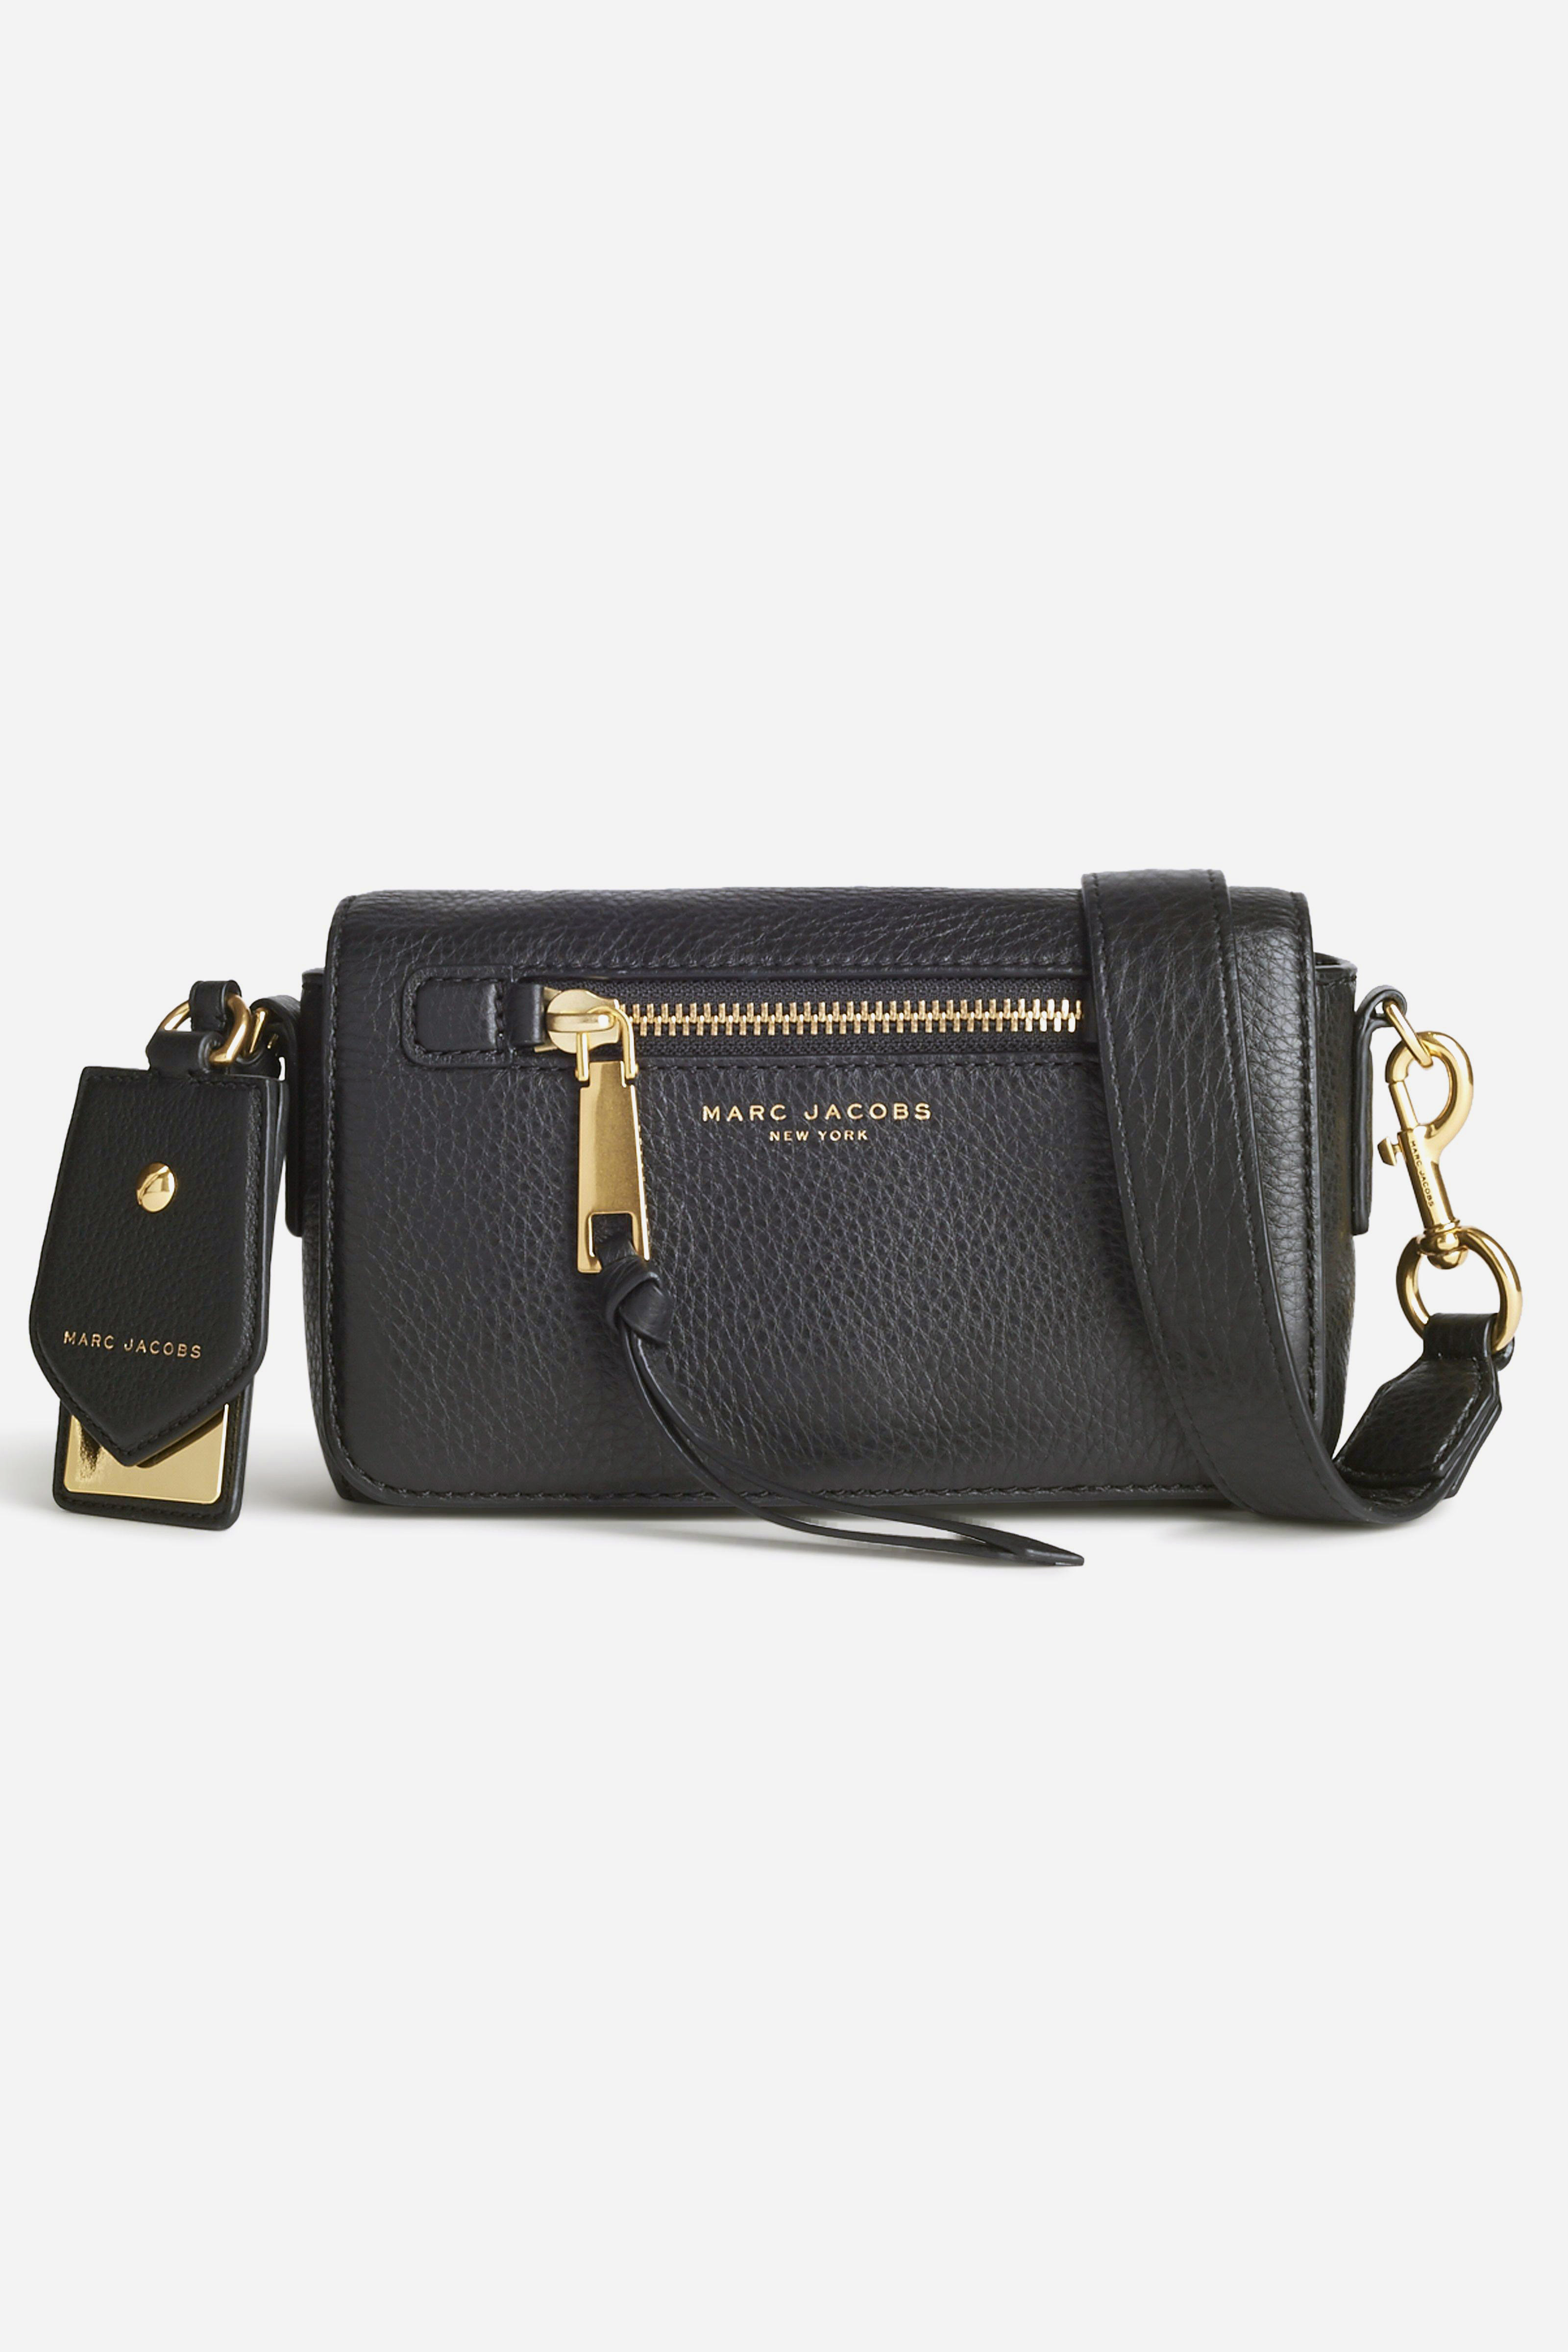 Marc Jacobs 19 - Recruit Crossbody Bag - Black